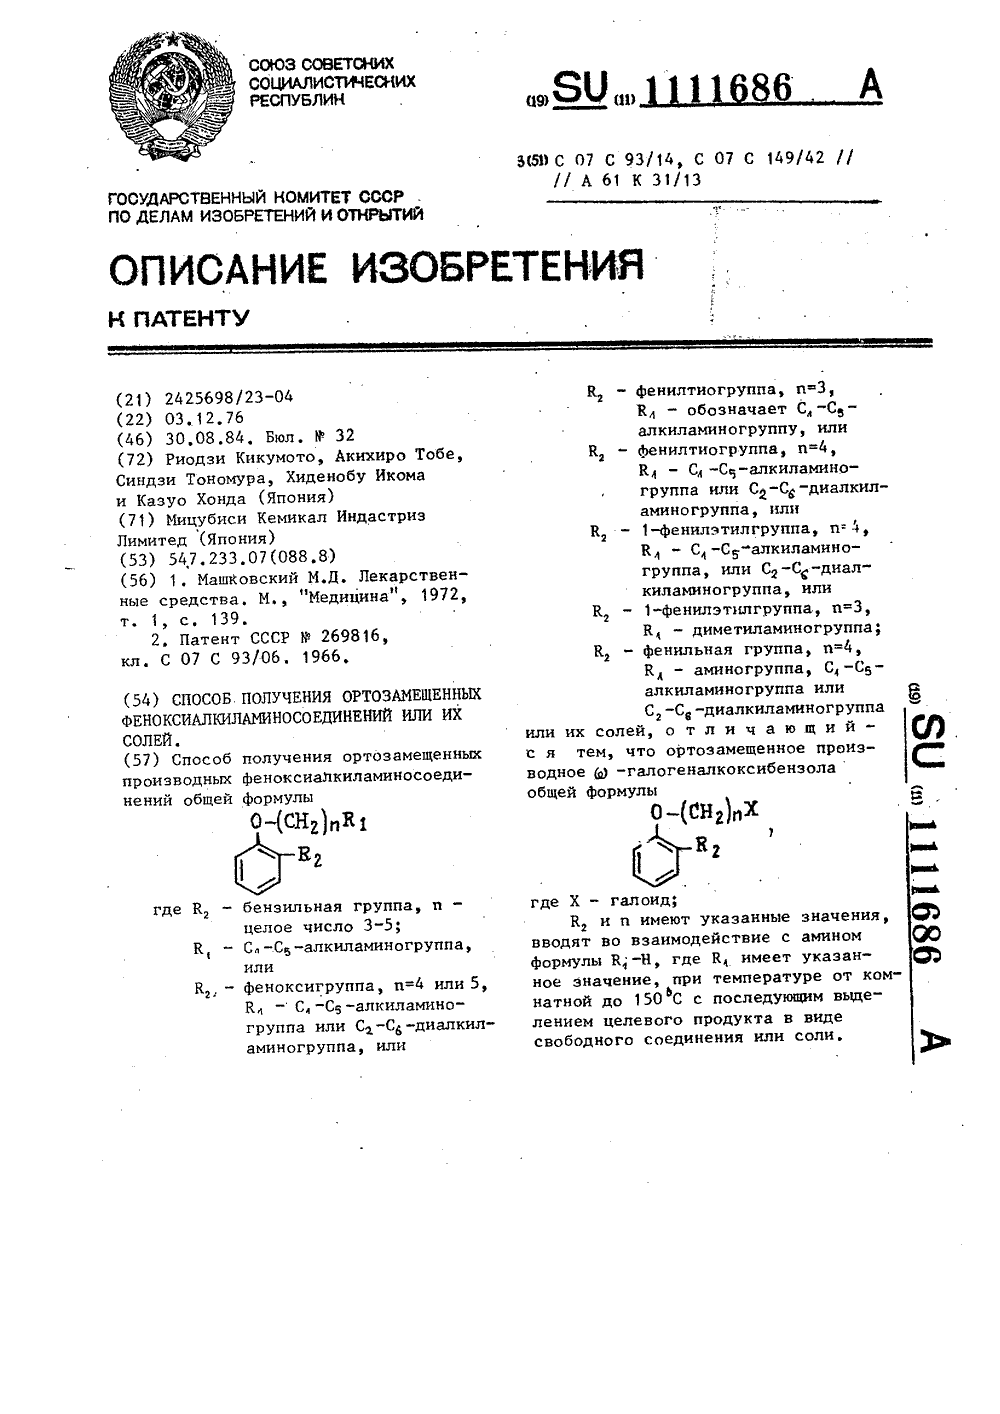 Фенолсульфофталеин